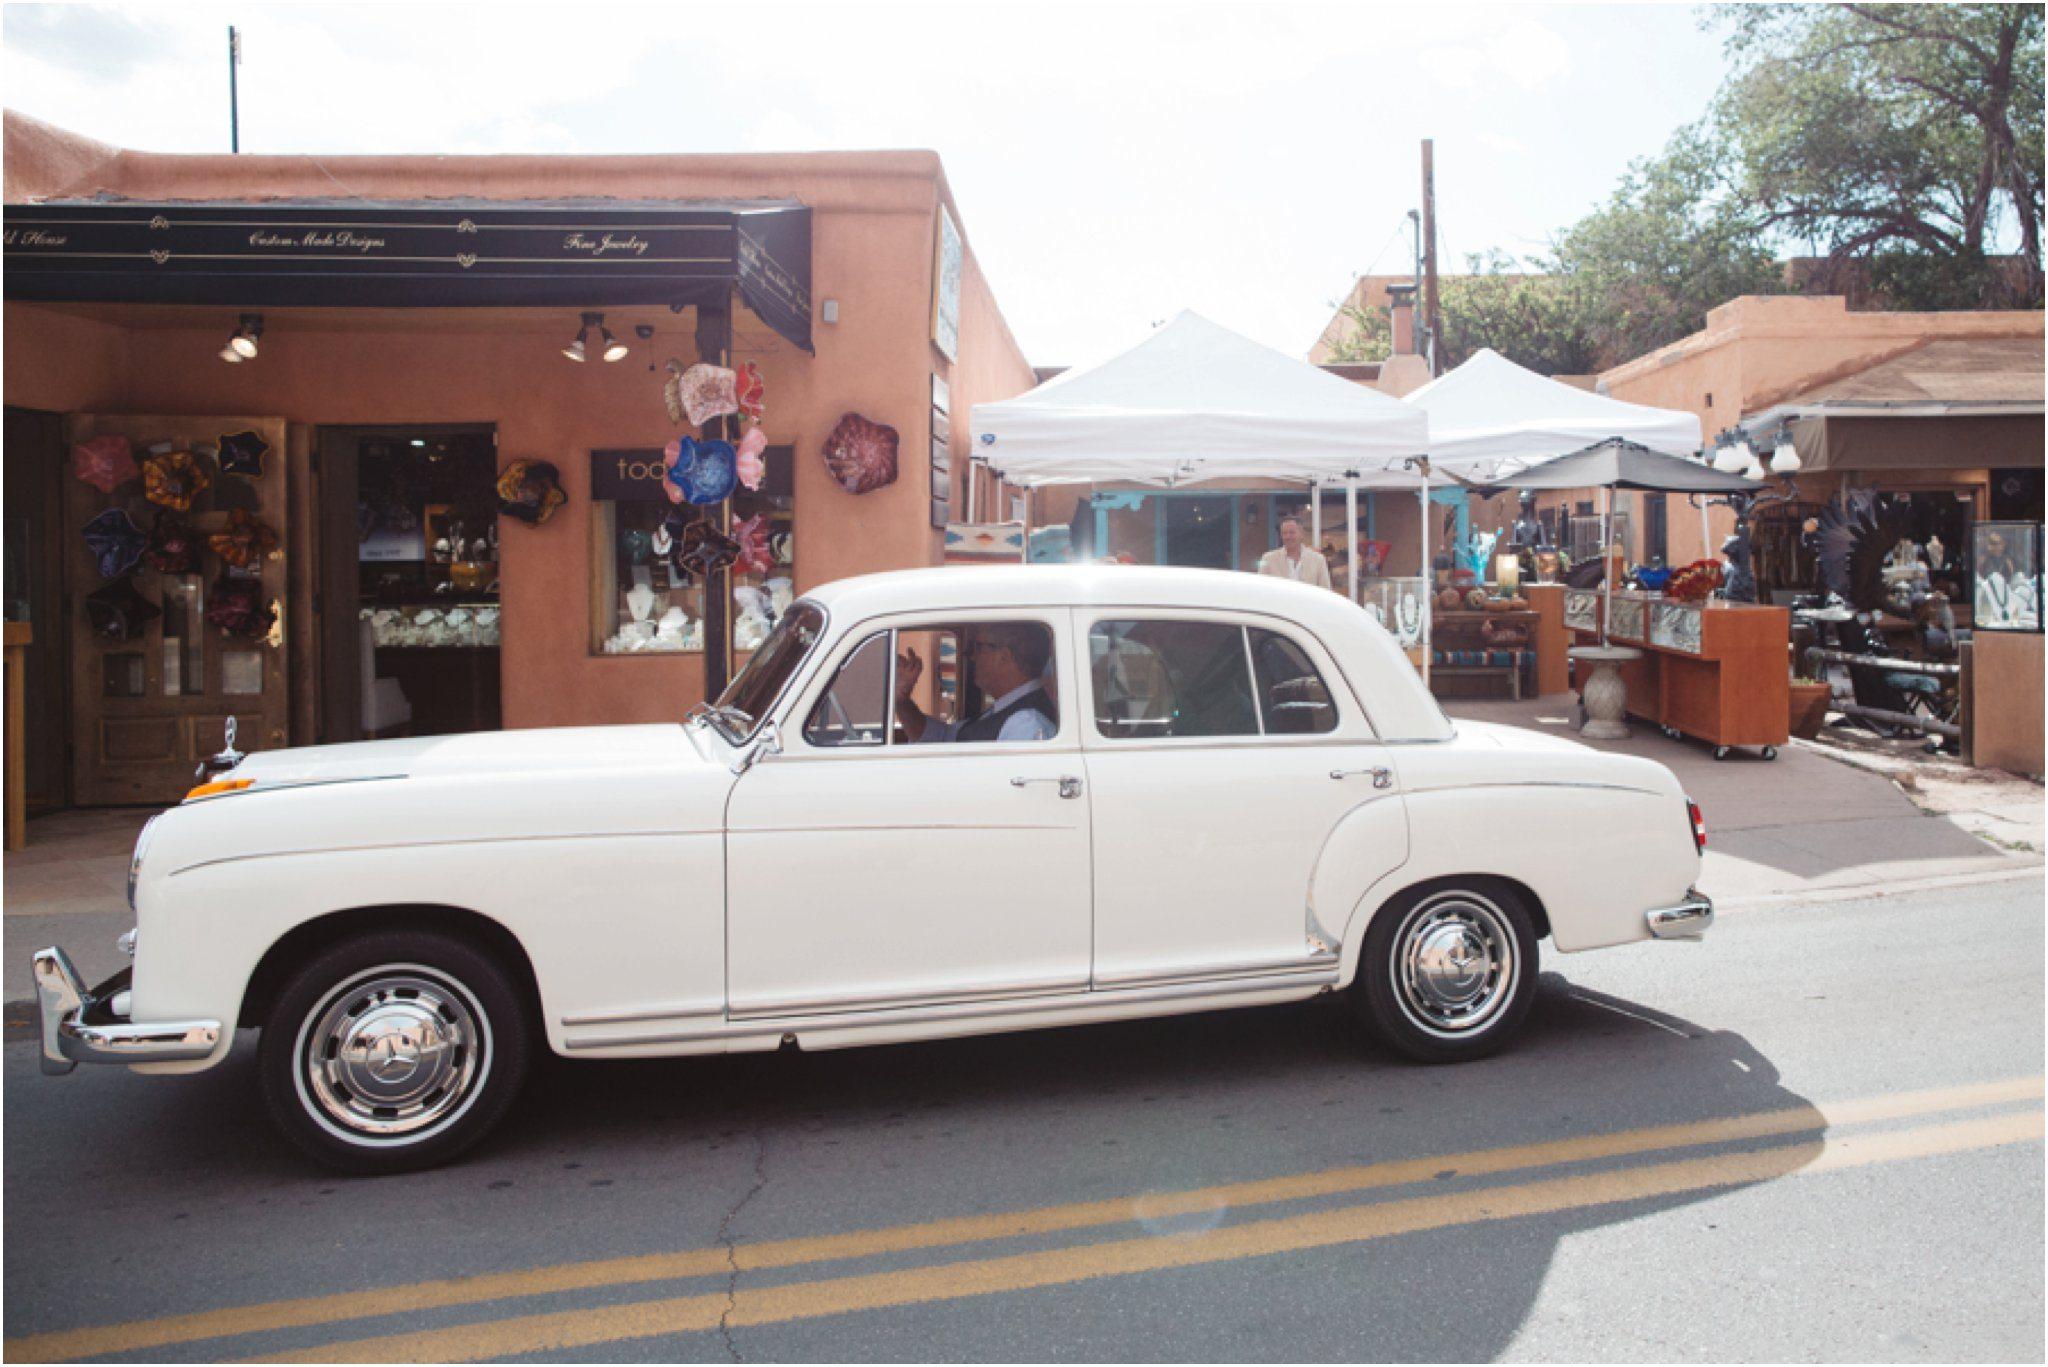 0010new-mexico-same-sex-wedding_santa-fe-wedding-photographer_albuquerque-wedding-photographer_top-photographer_-southwest-wedding-photography_-blue-rose-studio